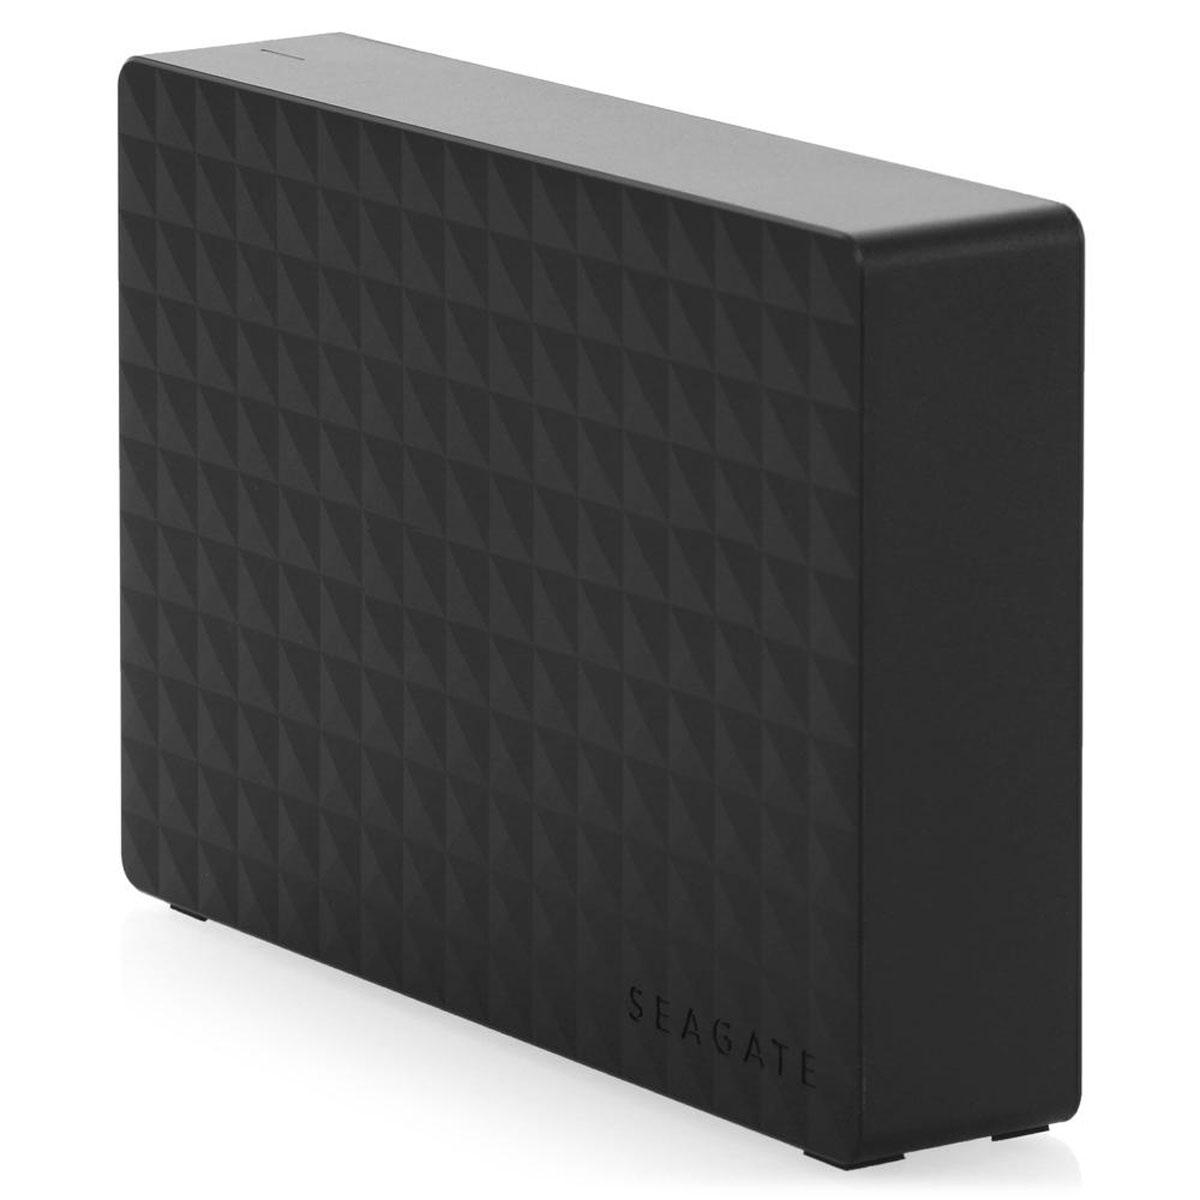 Seagate Expansion 2TB (STEB2000200) внешний жесткий диск